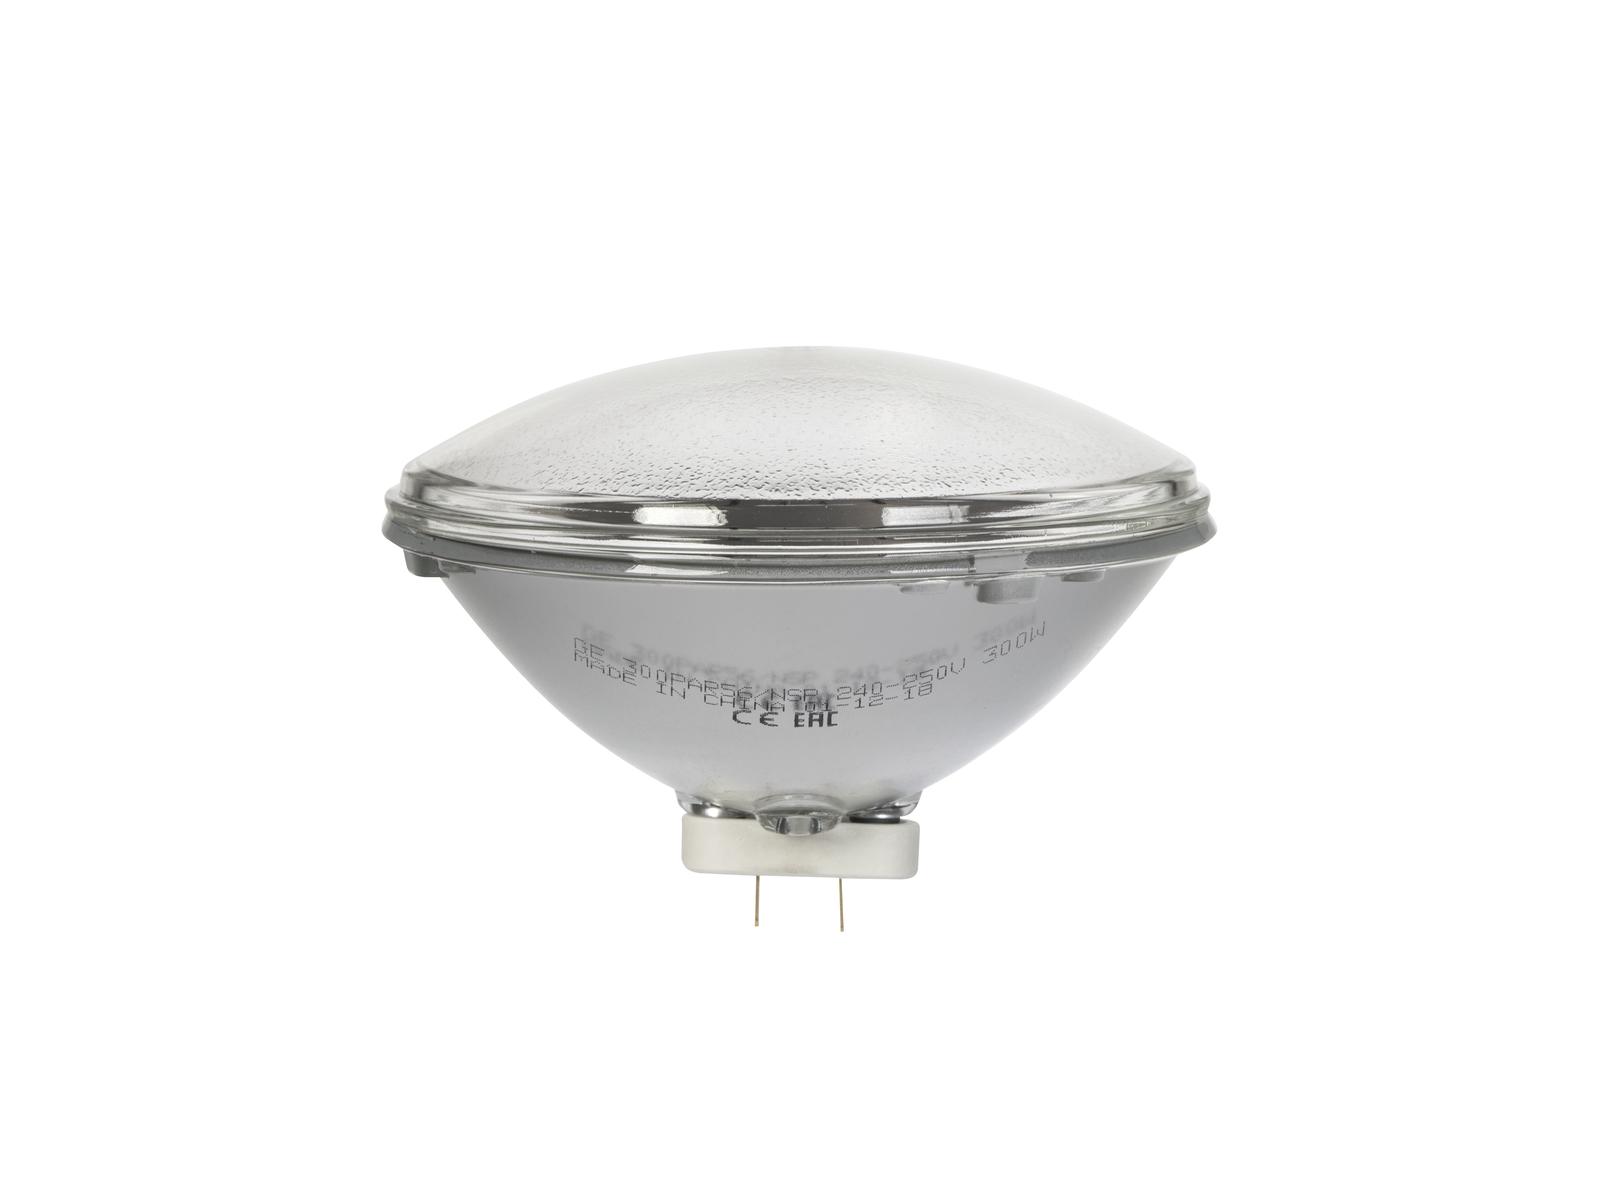 Lampada Faro per PAR-56 GE PAR-56 240V/300W NSP 2000h 2750 K